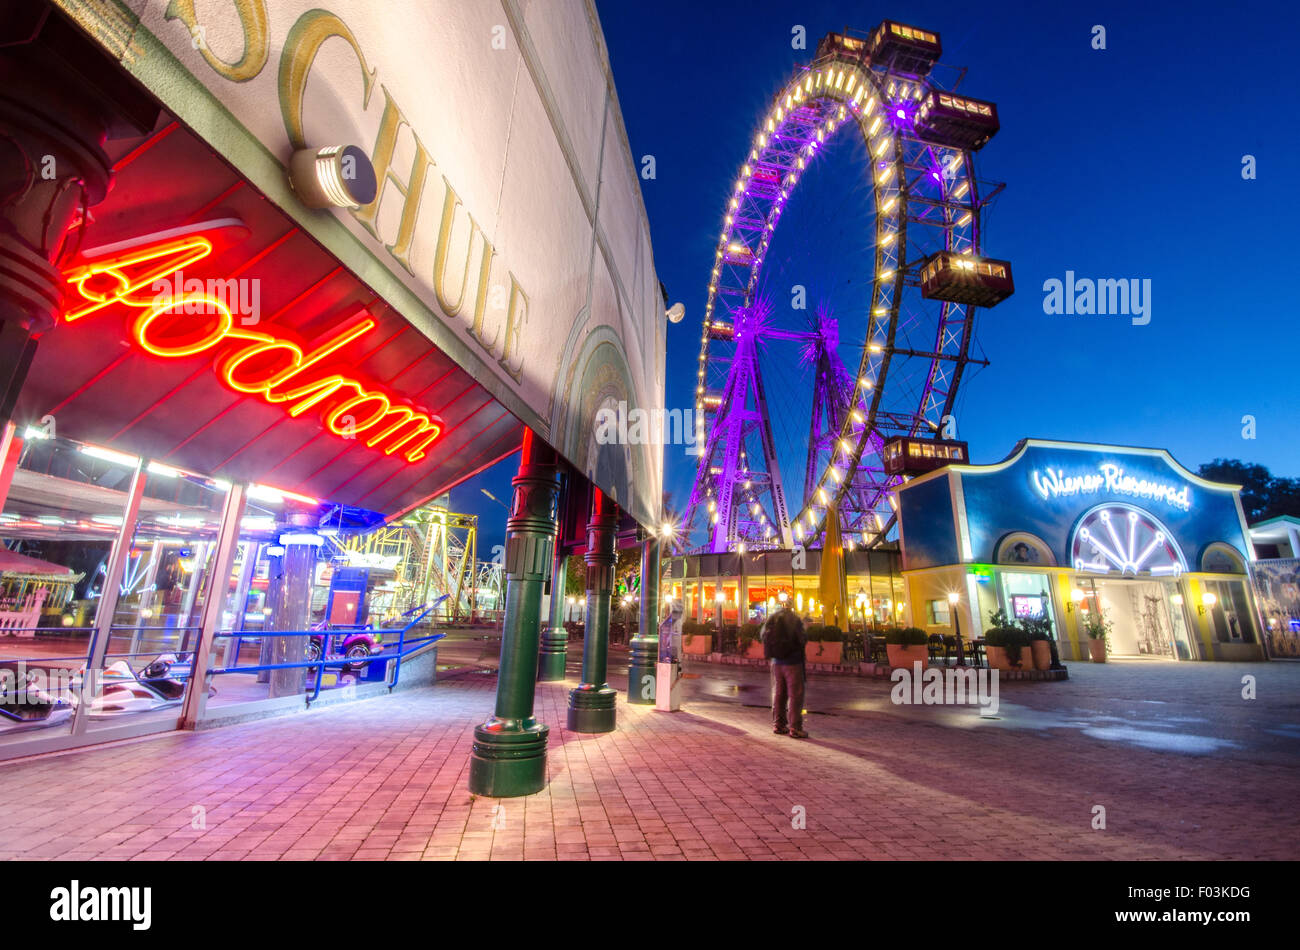 Riesenrad in Vienna with some night lights around. - Stock Image